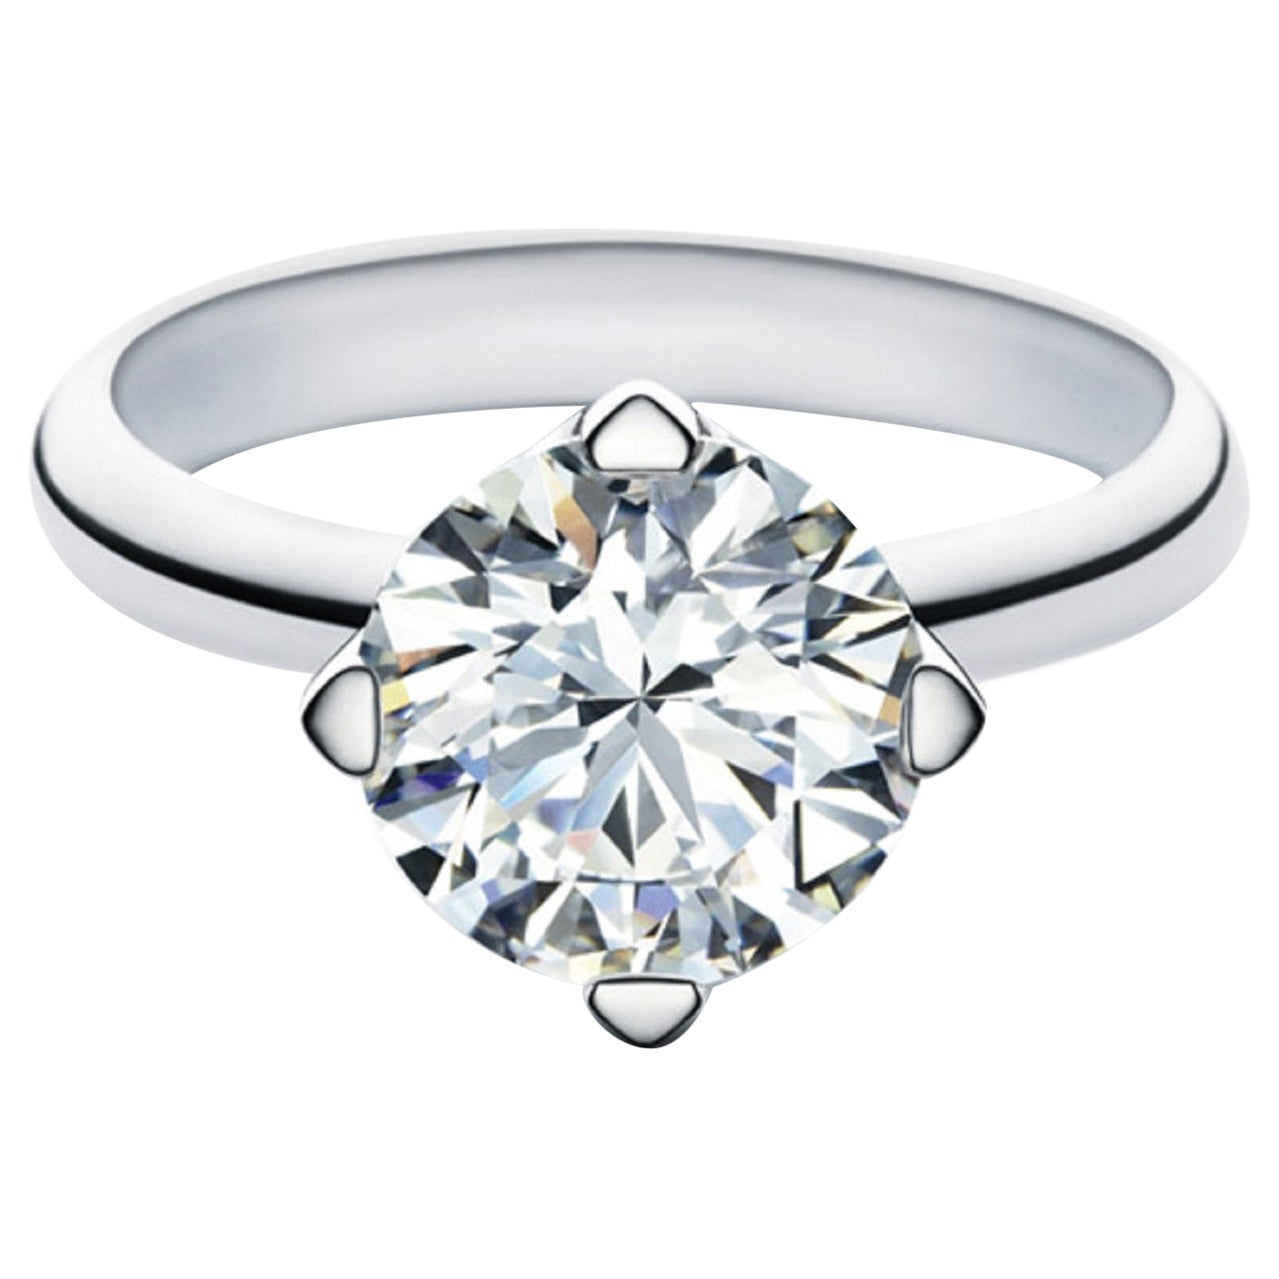 GIA Certified 2 Carat Round Brilliant Cut Diamond Ring VVS2